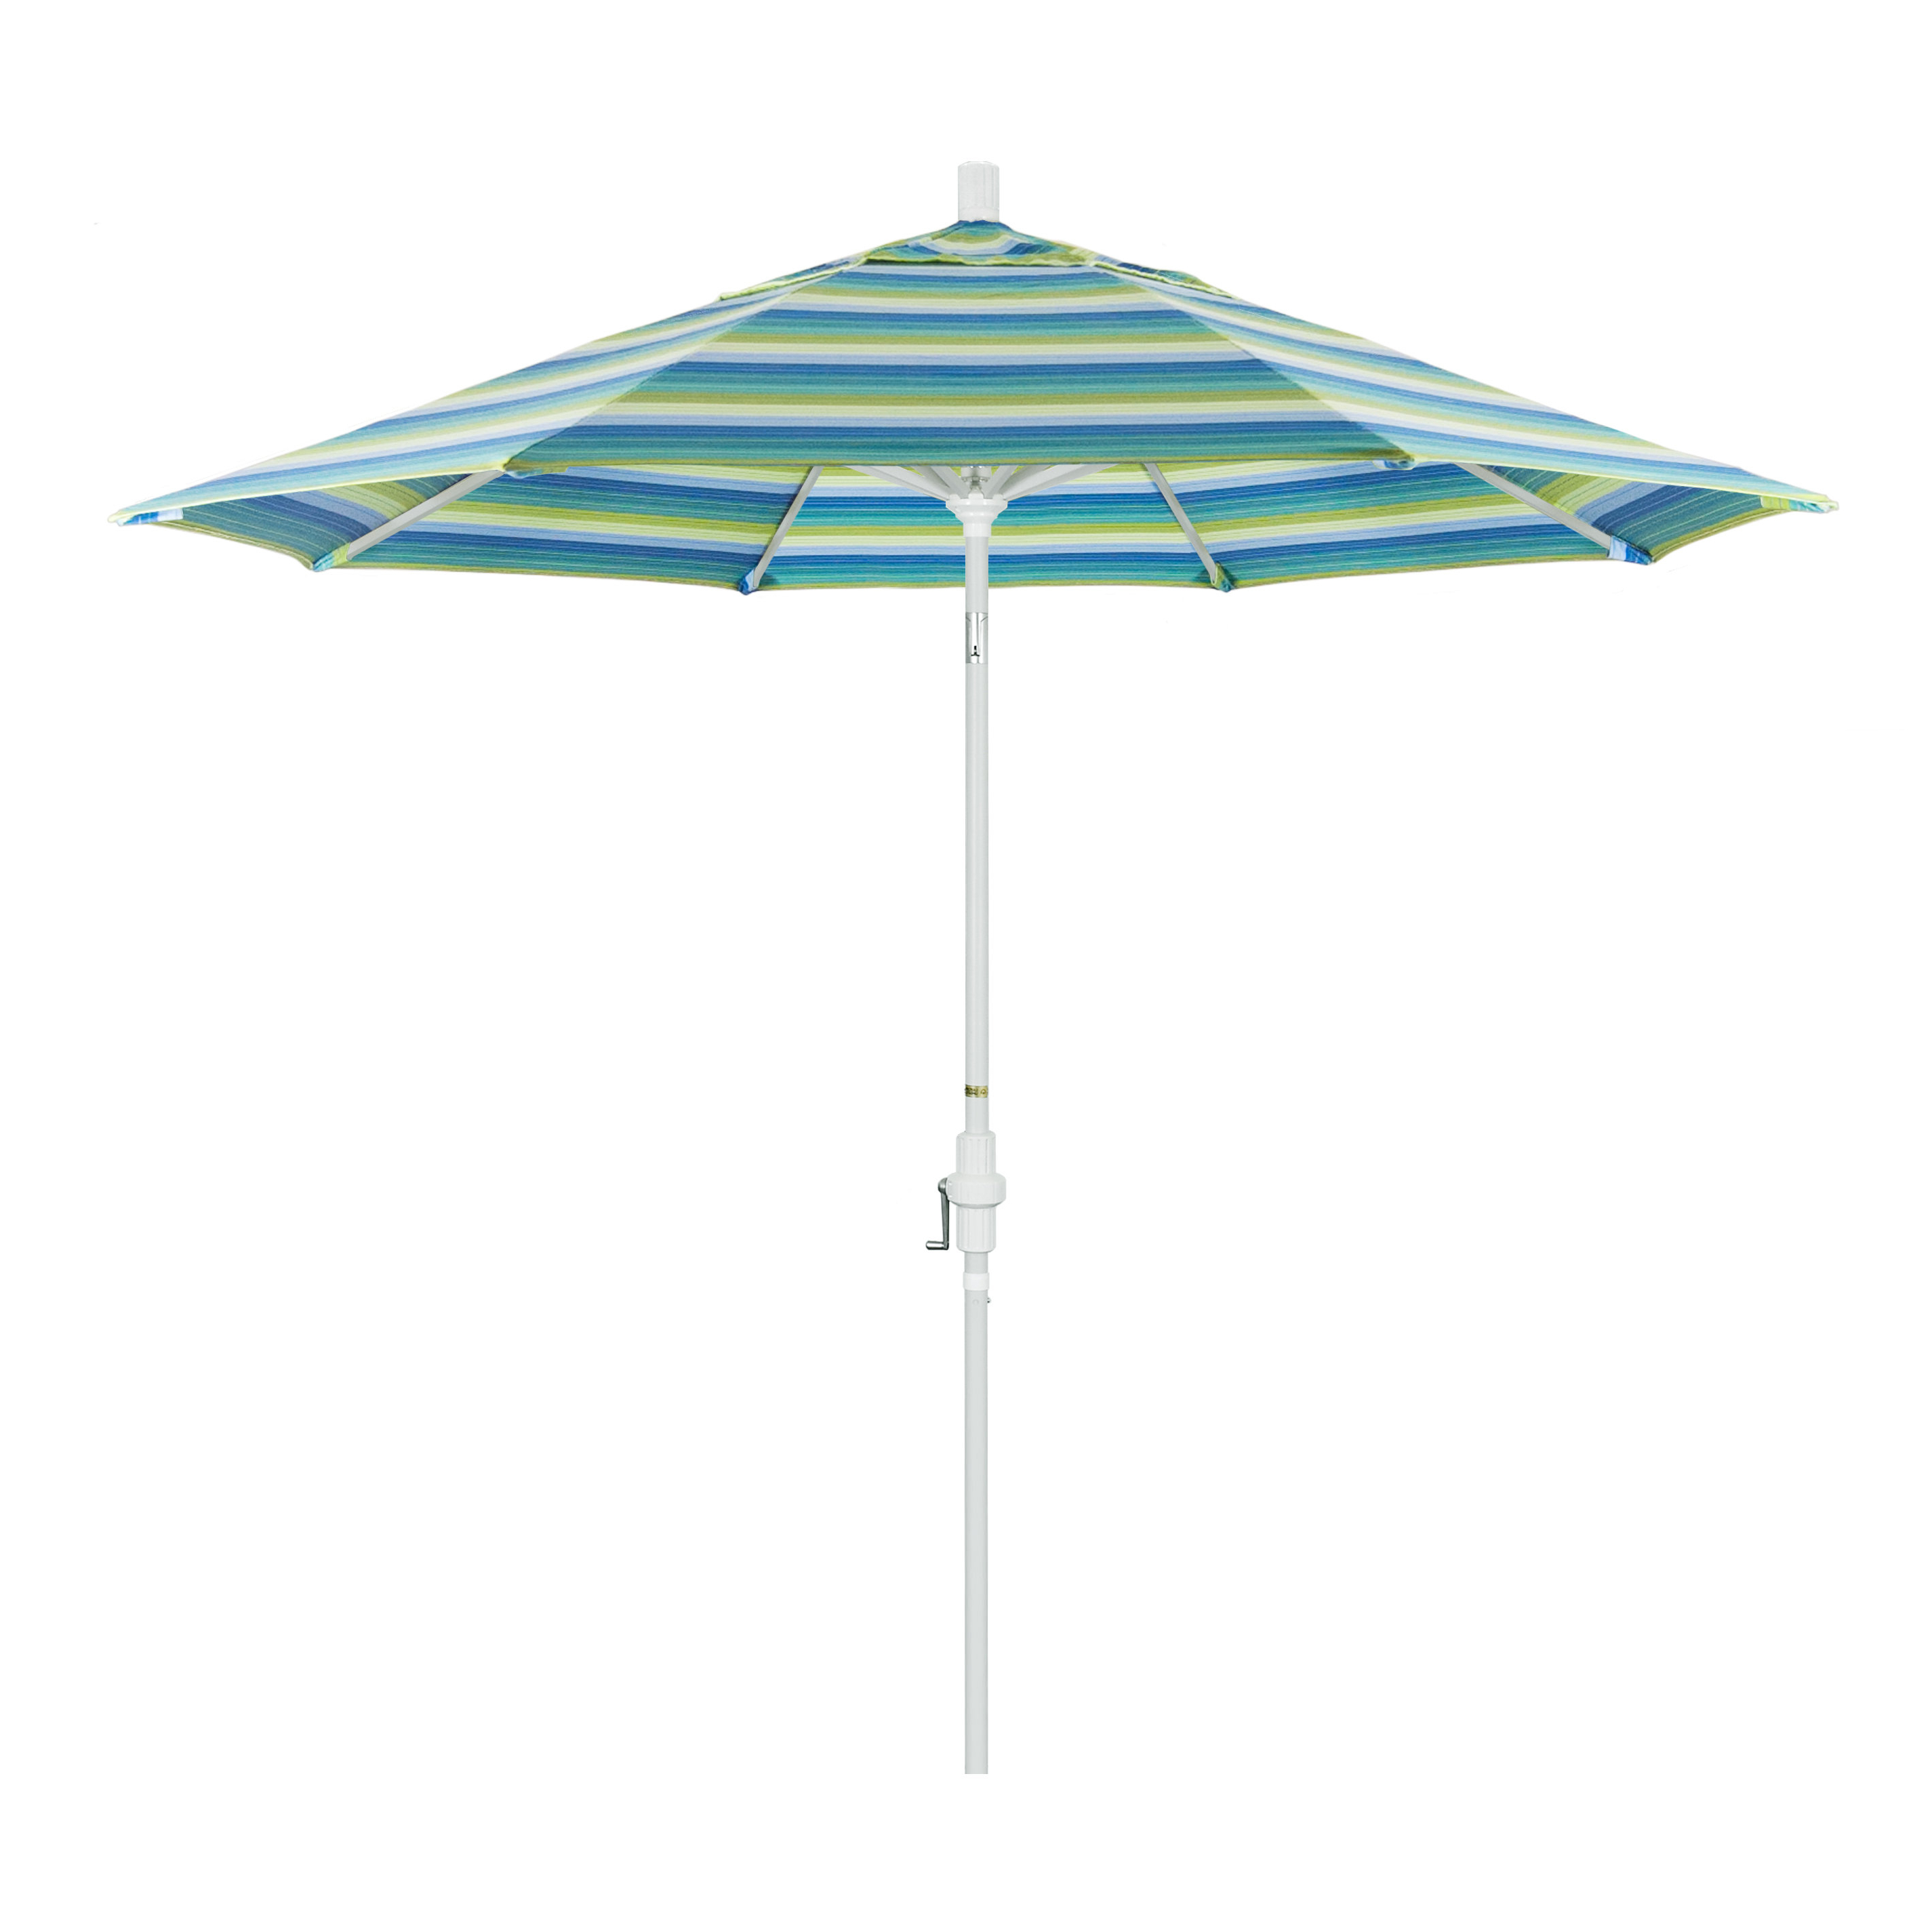 Mullaney Market Sunbrella Umbrellas Throughout Most Recent Golden State Series 9' Market Sunbrella Umbrella (View 15 of 20)